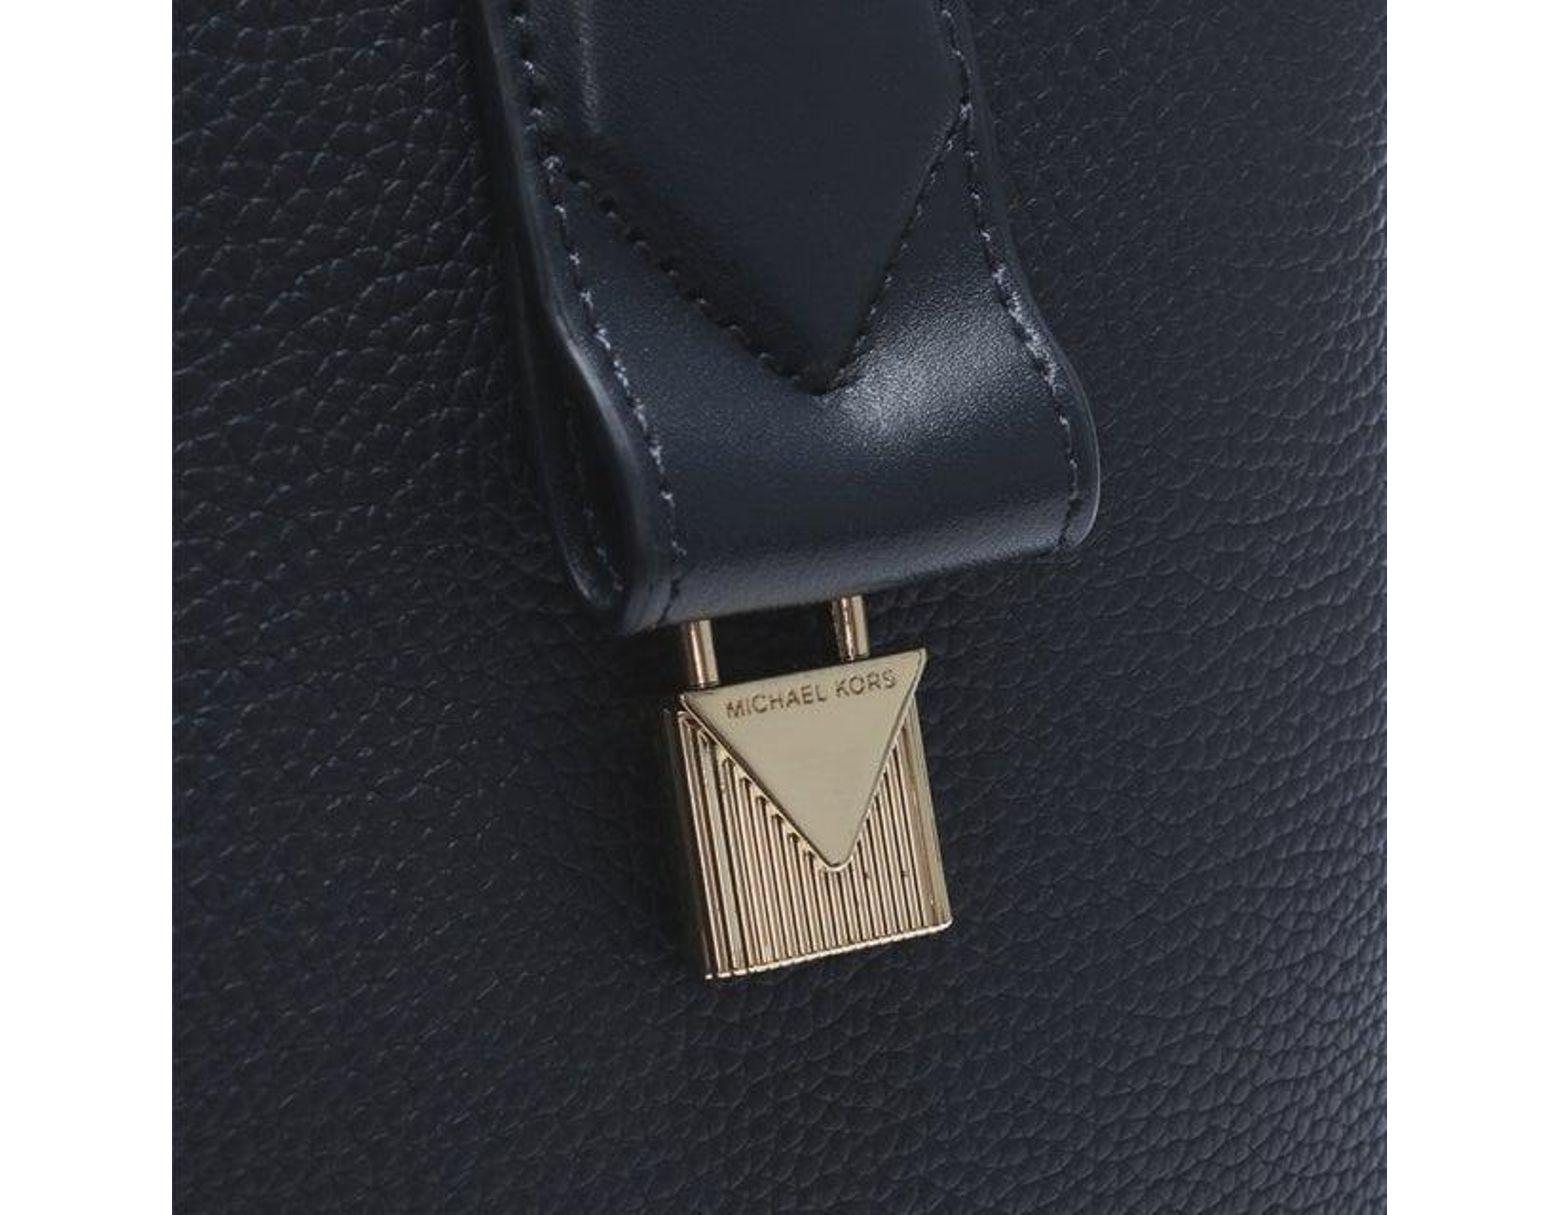 6d5833c6051e Michael Kors Large Rollins Admiral Pebbled Leather Satchel Bag in Blue -  Lyst